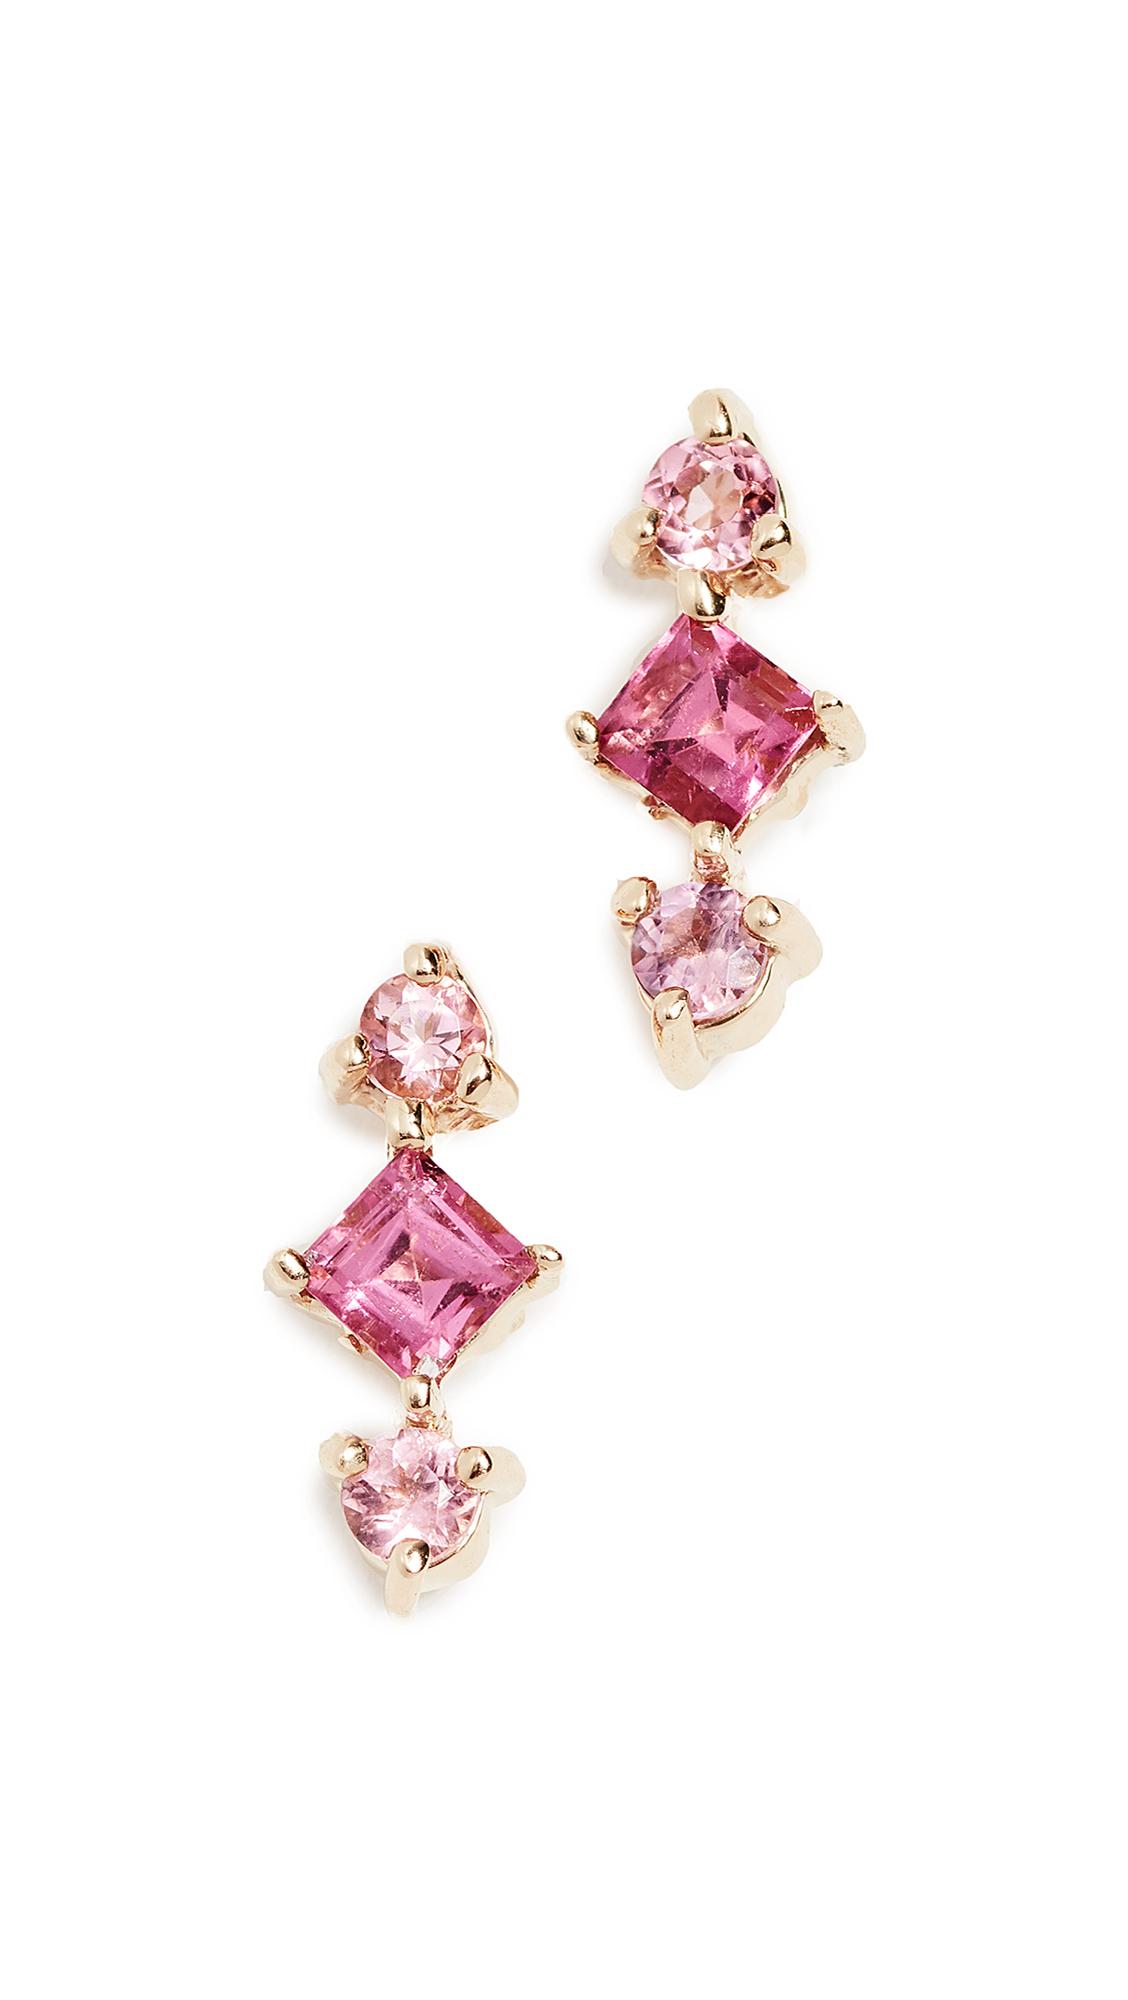 14K Gold Shades Tourmaline Earrings, Yellow Gold/Pink